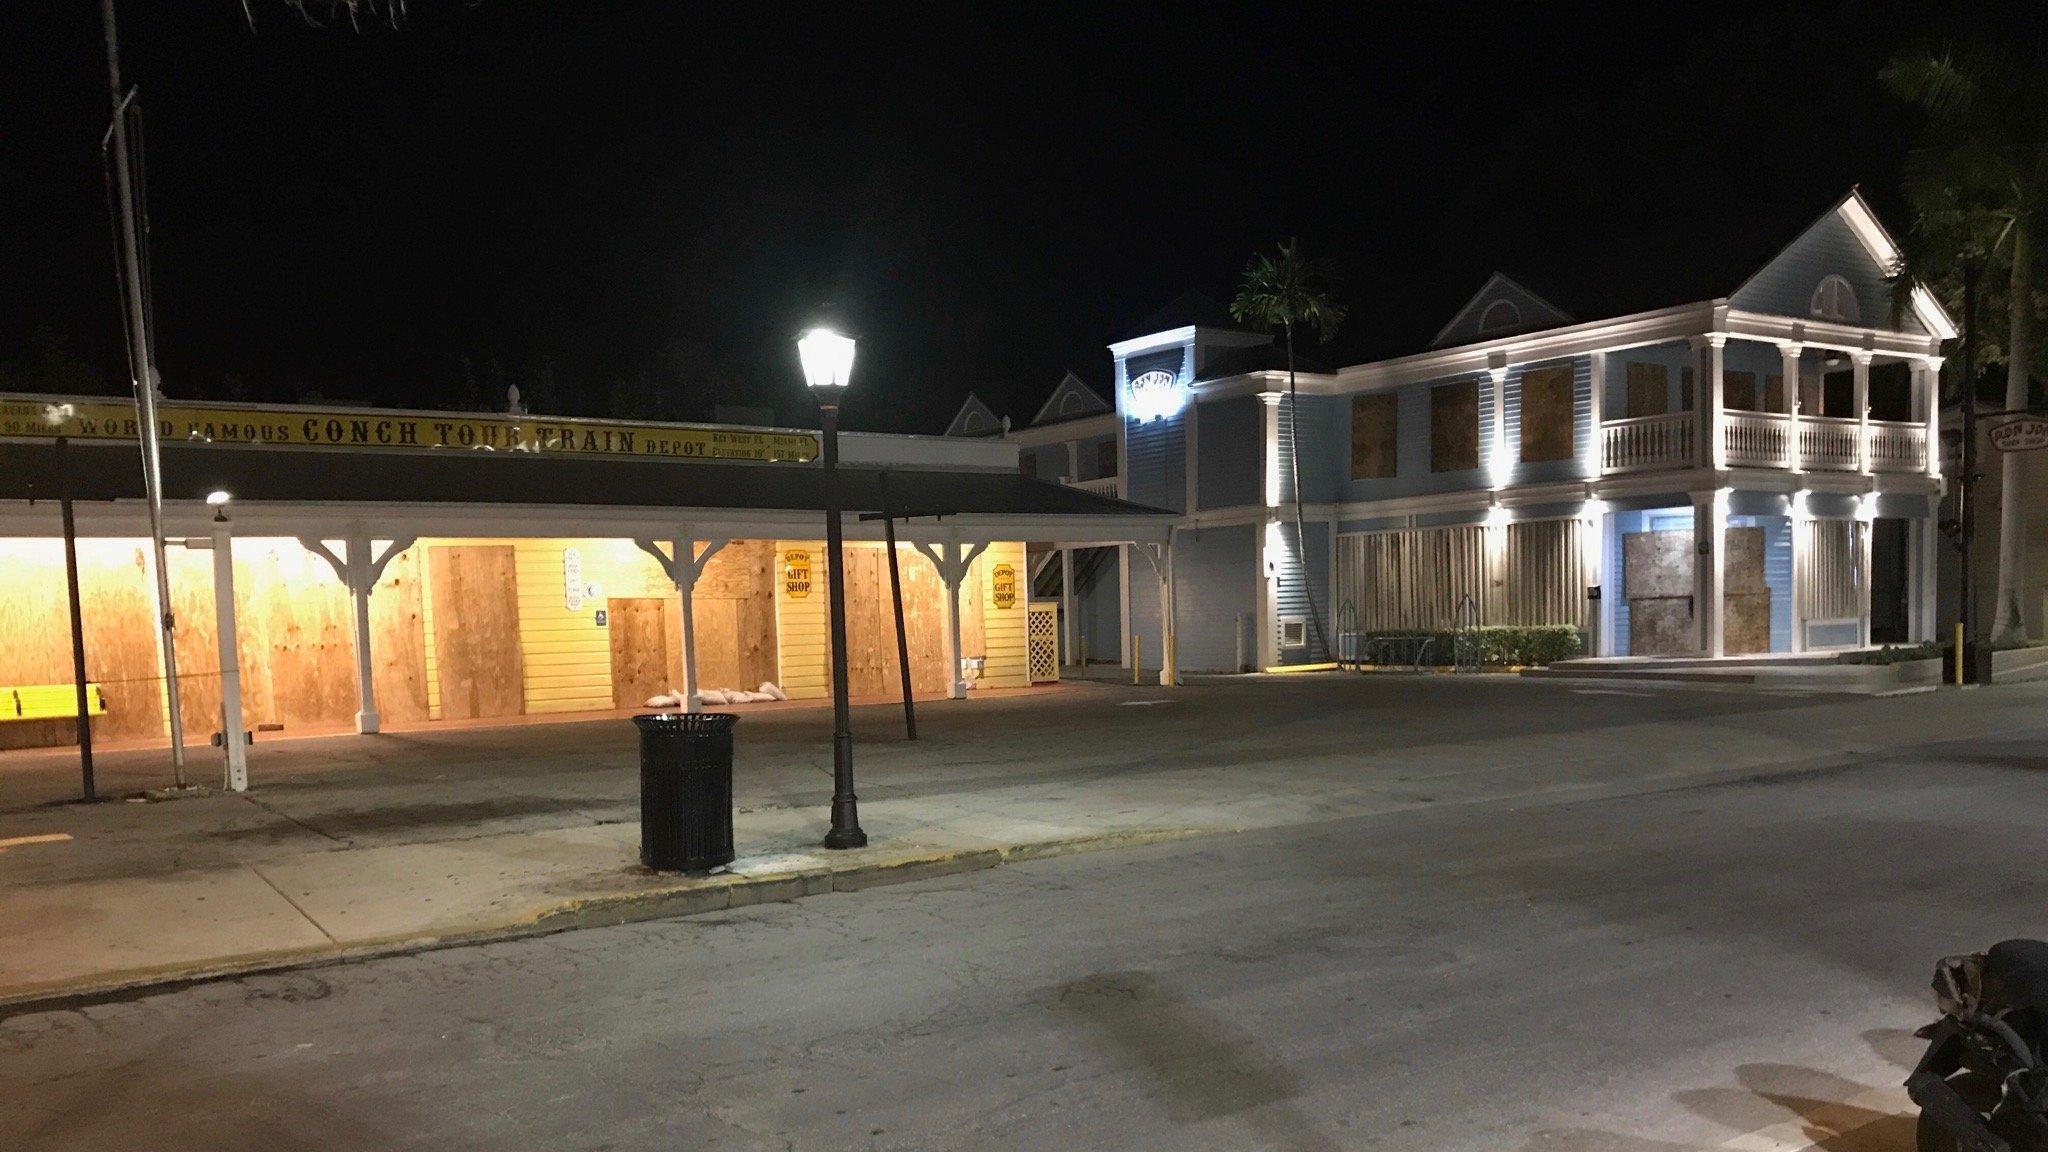 Old Town Key West before Hurricane Irma